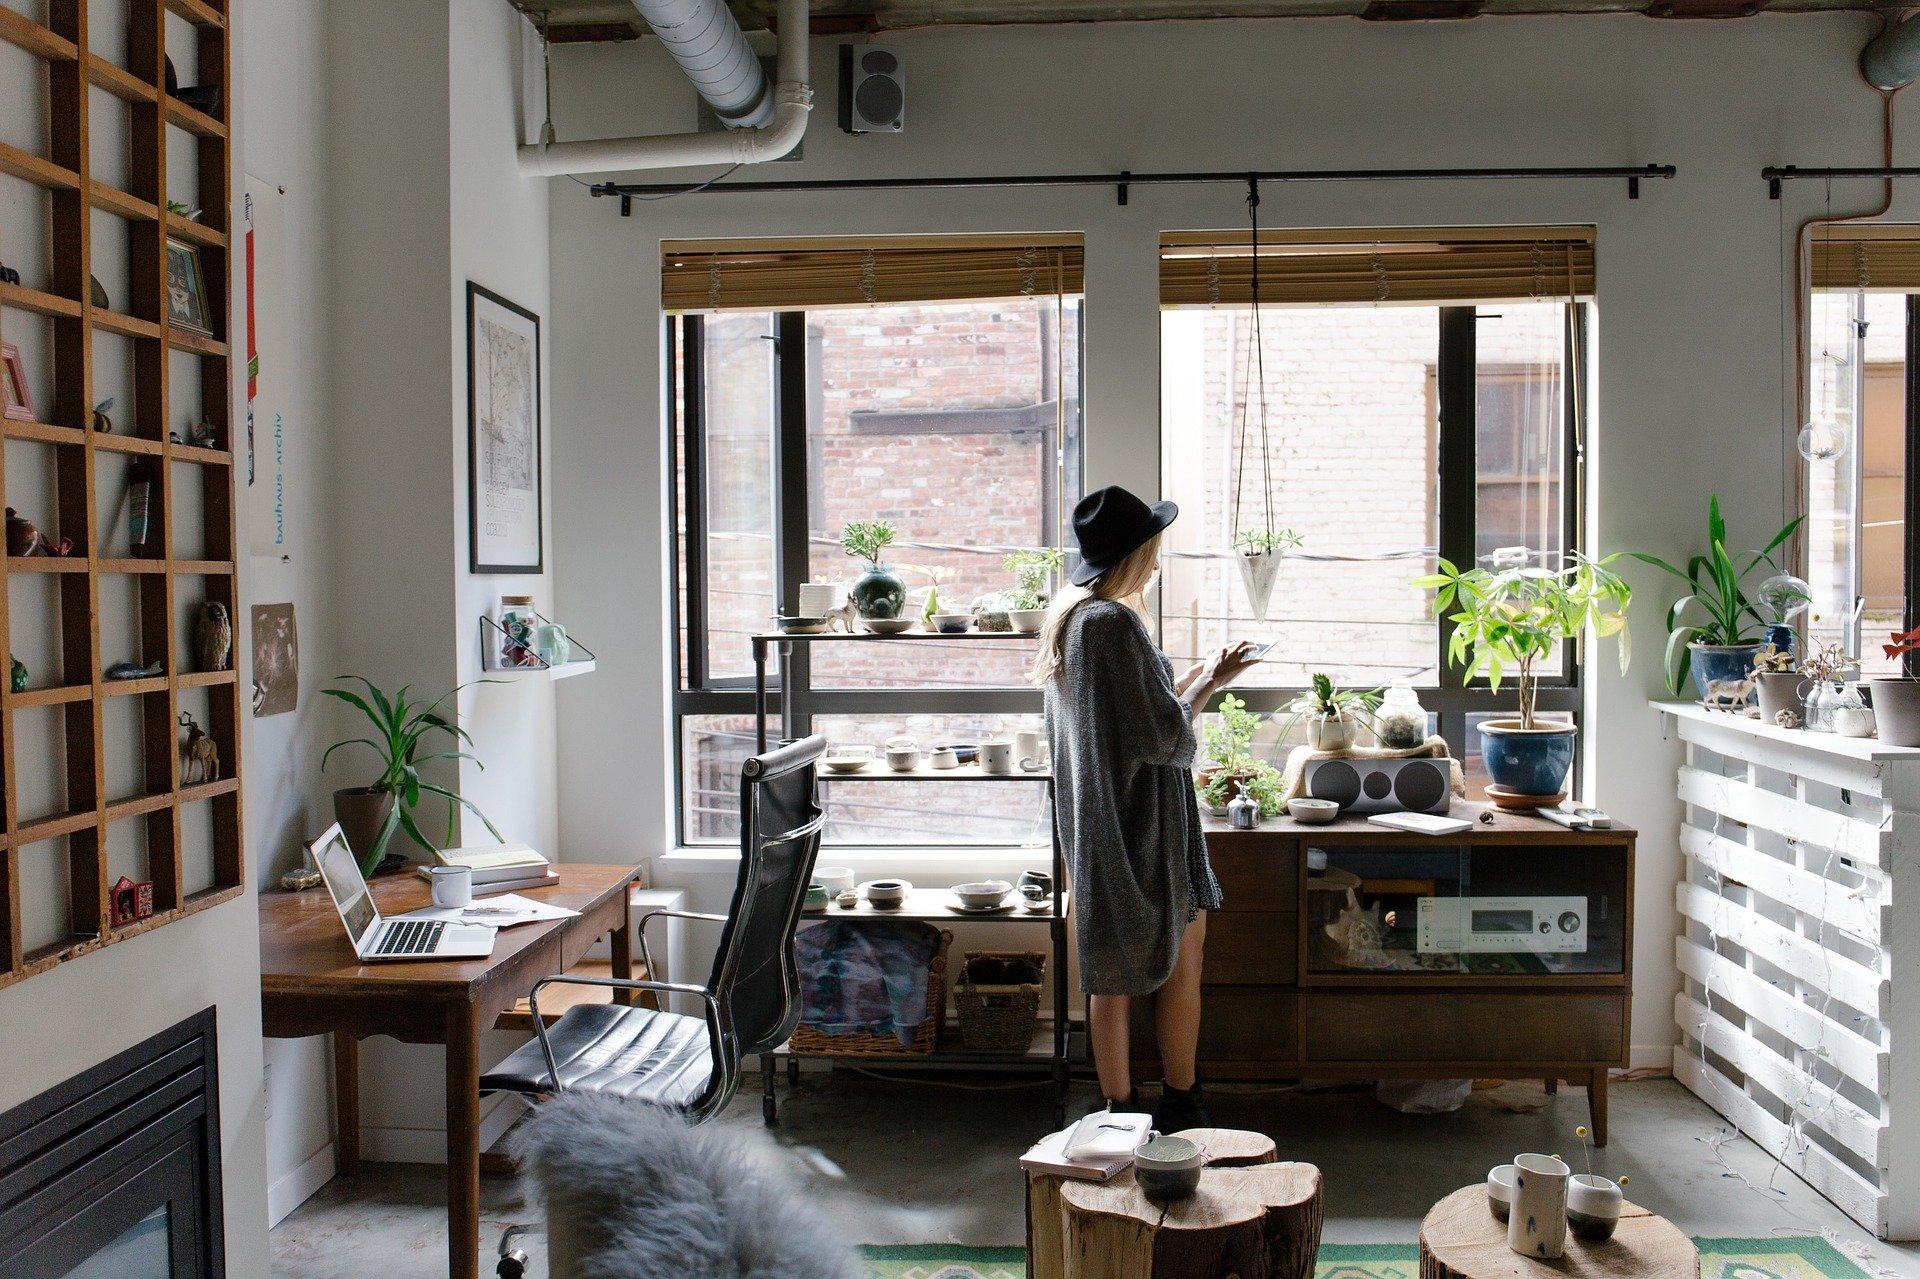 Lány otthoni munkavégzés közben